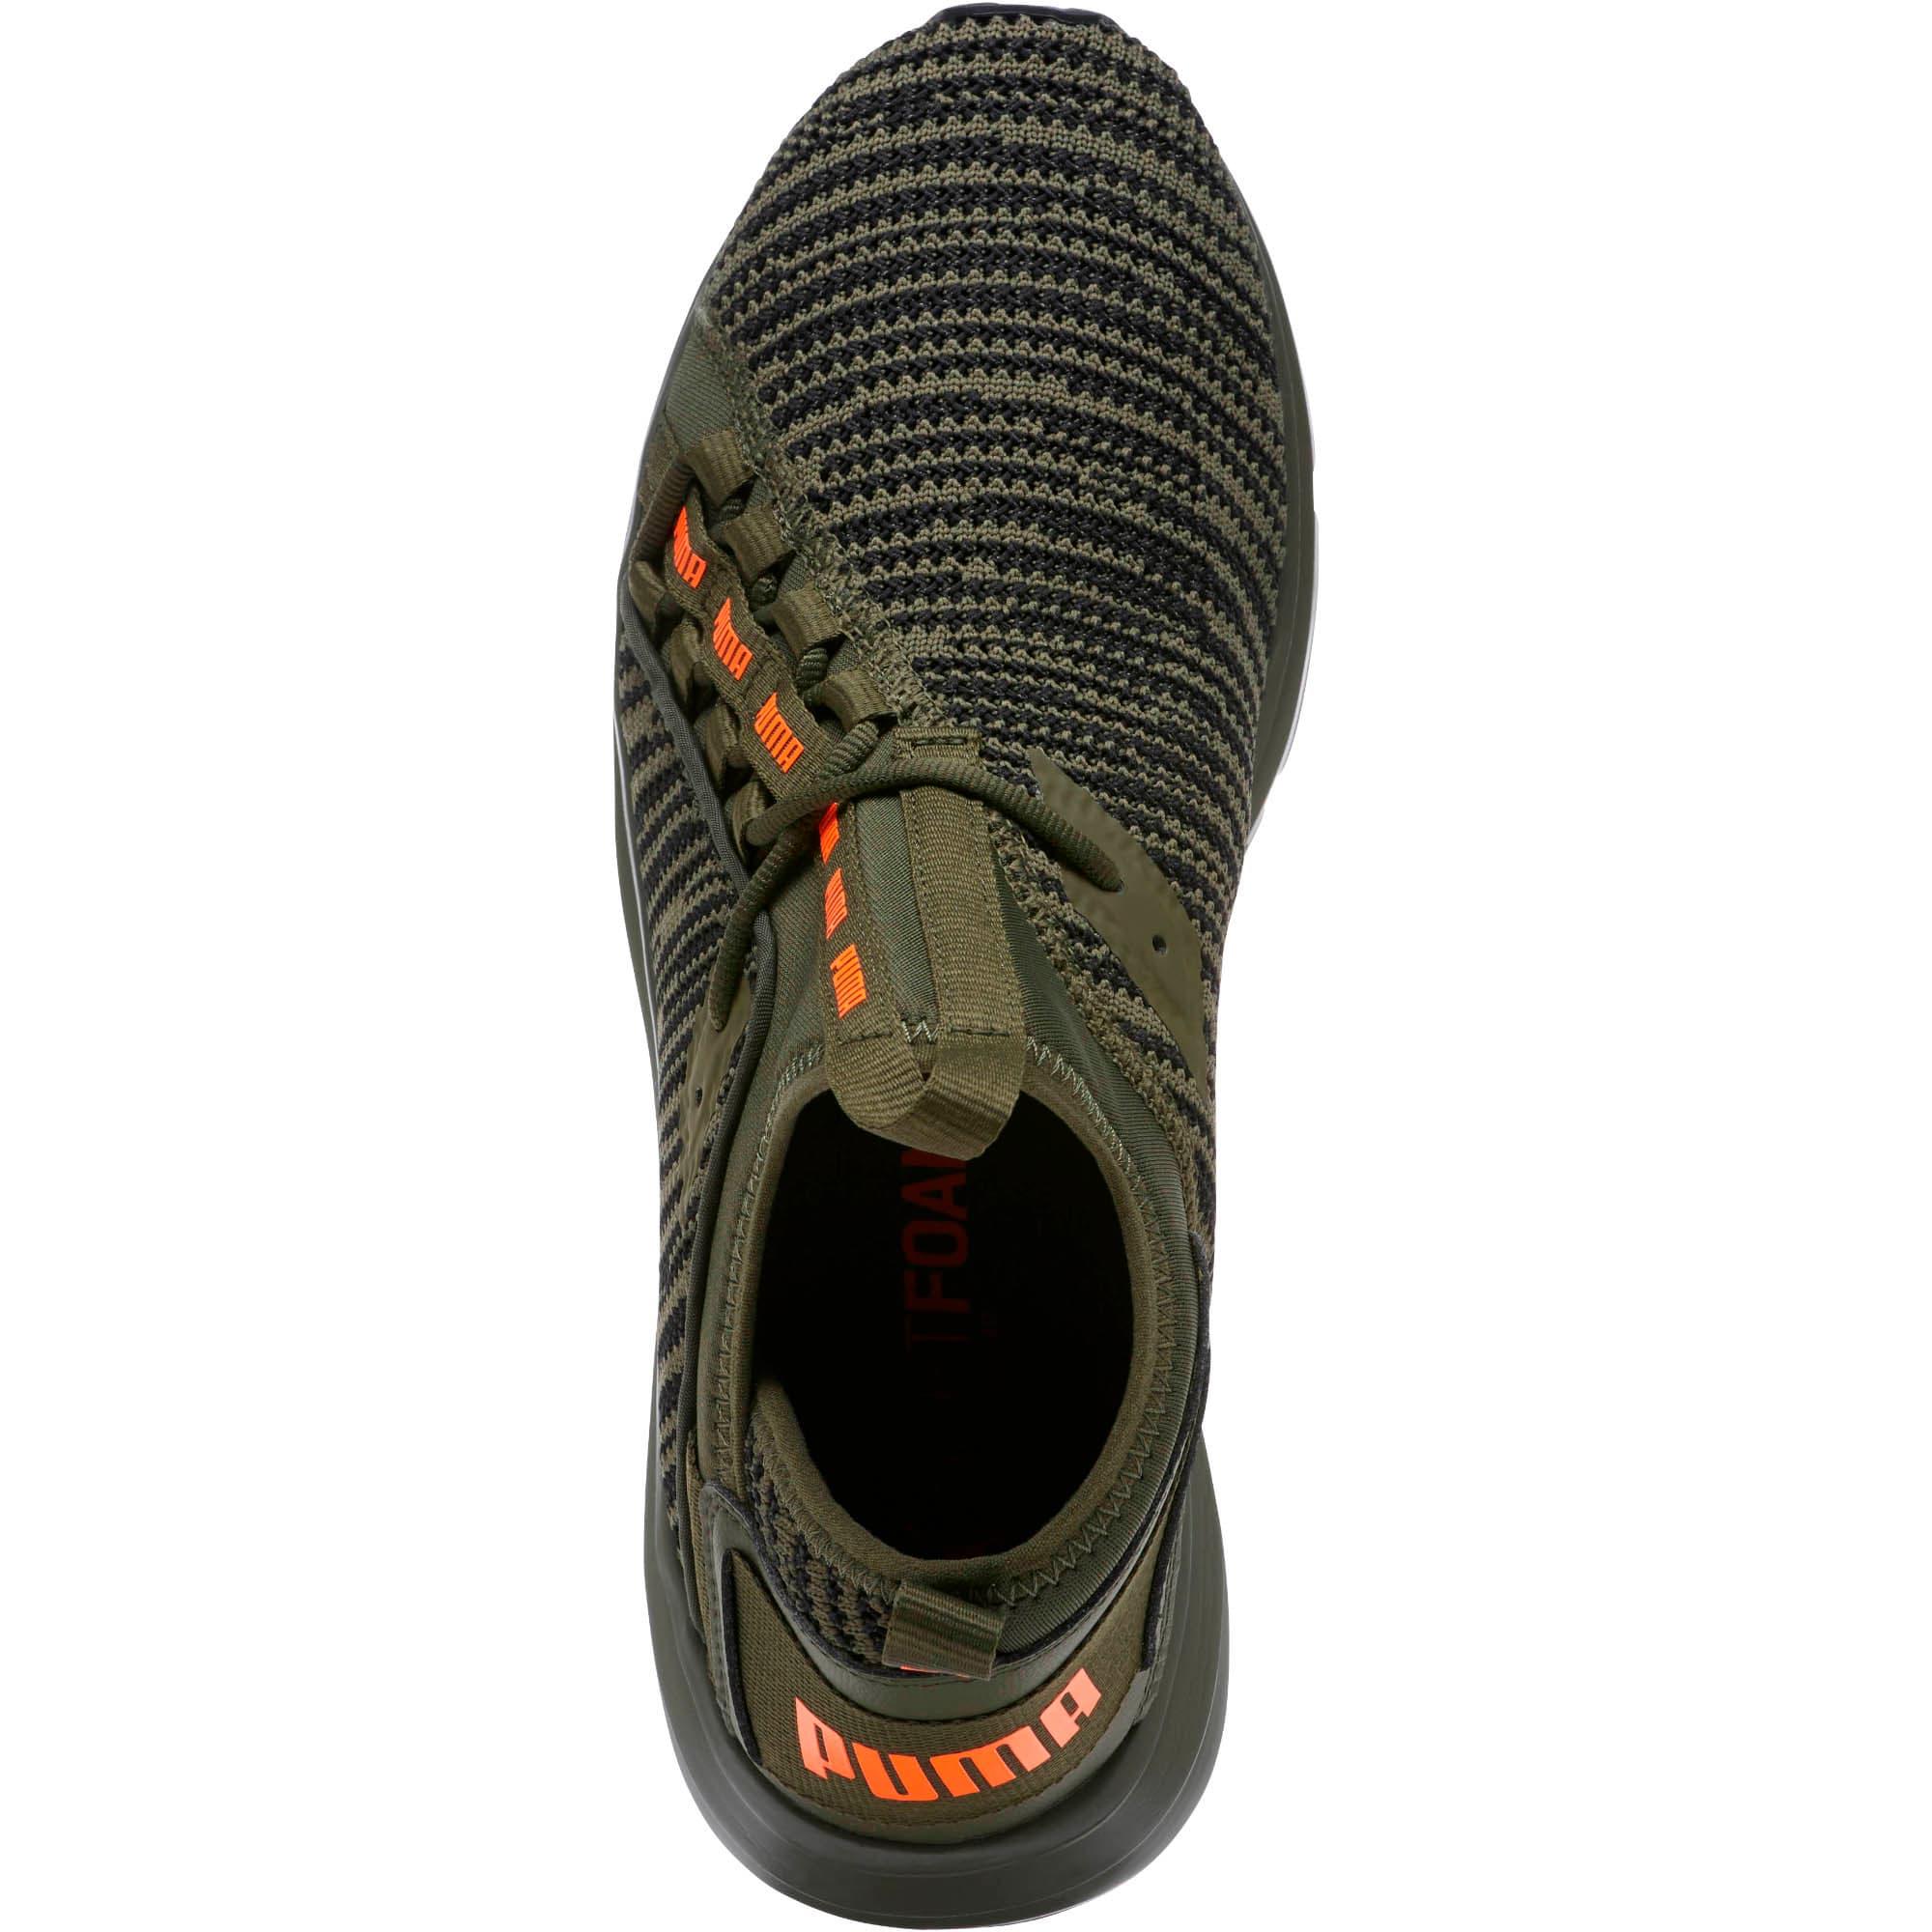 Thumbnail 5 of Enzo Peak Men's Sneakers, Forest Night-Black-Orange, medium